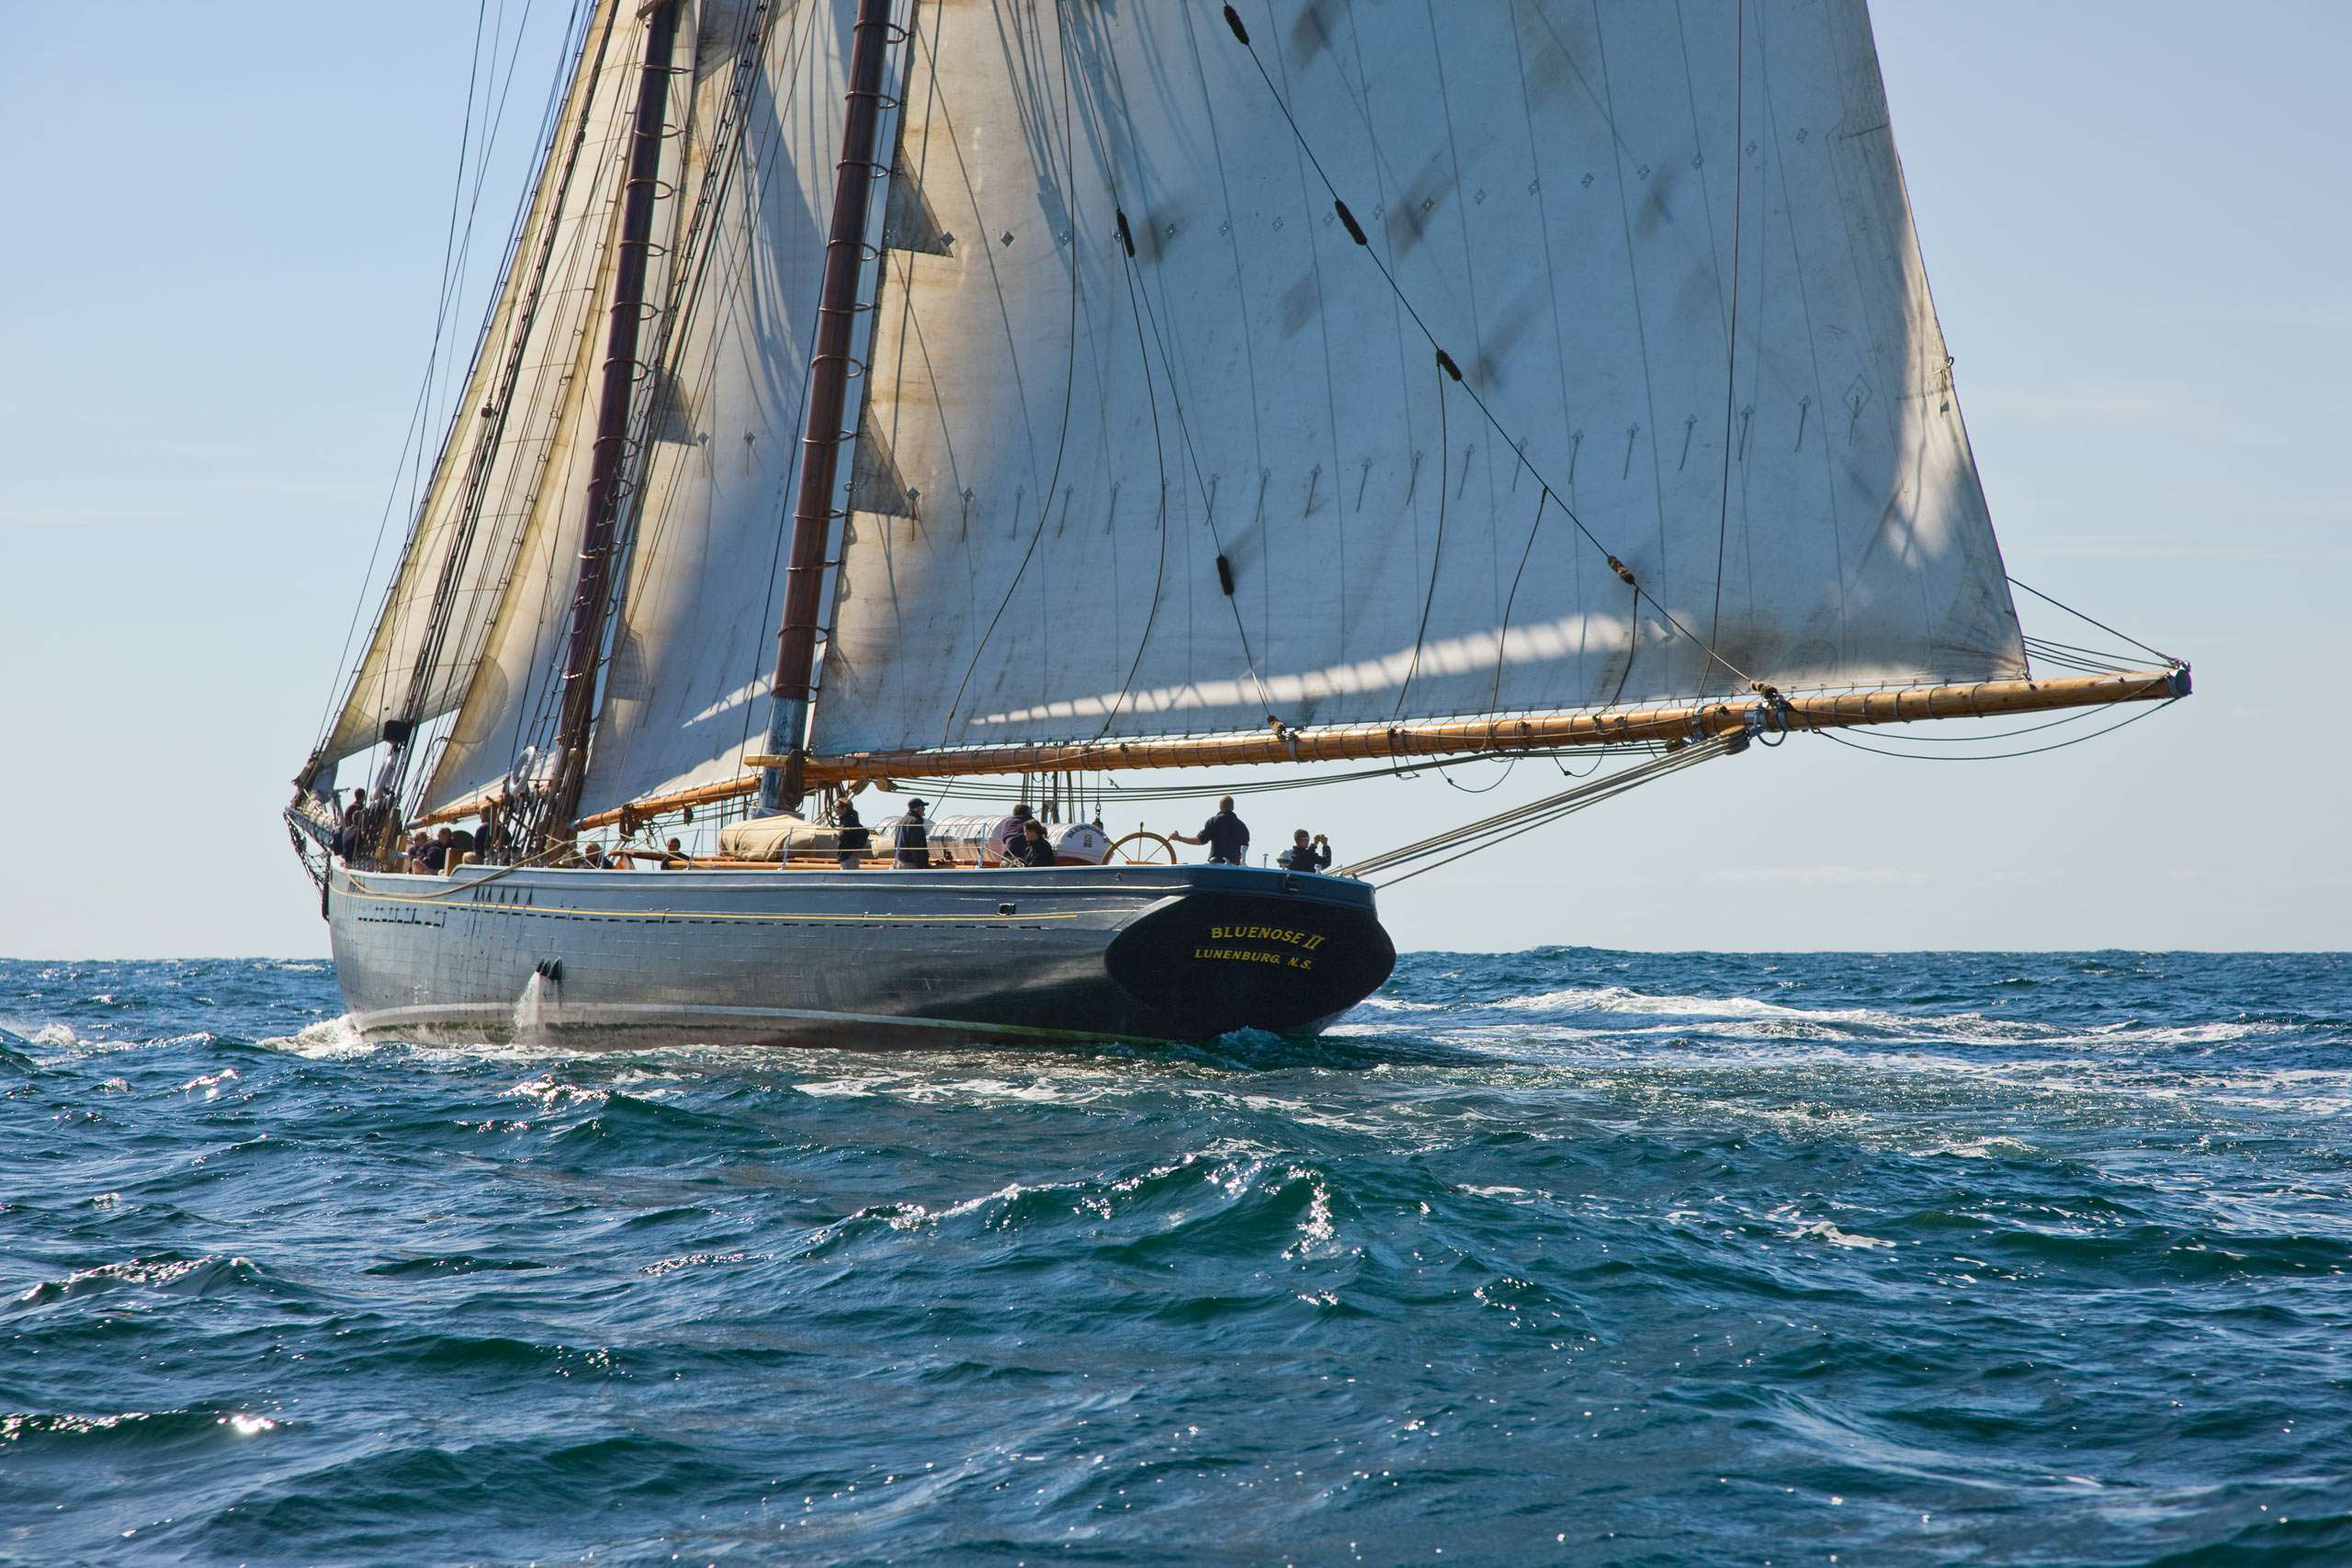 PORTFOLIO - Sailing - Windjammers #13   PCG445